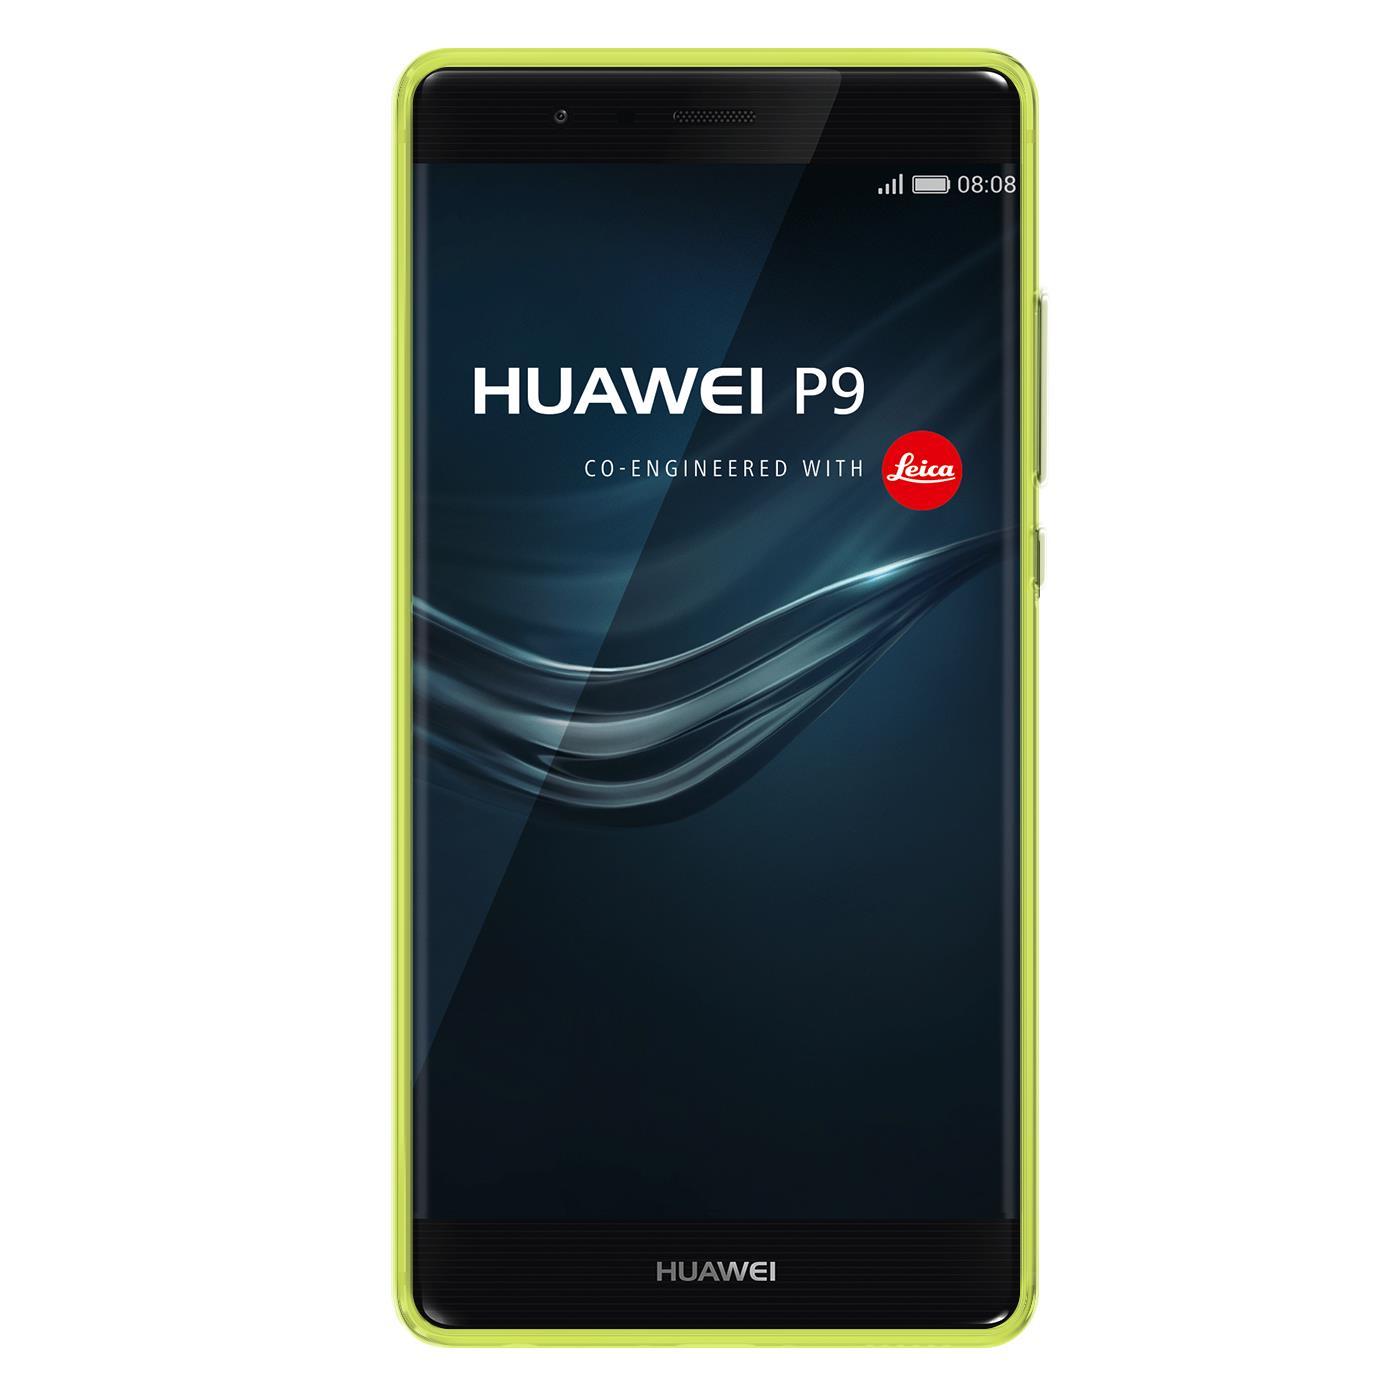 Huawei-p9-Duenn-Silikon-Klar-Case-Cover-Ultra-Slim-Stossfeste-Gel-Rueckseite Indexbild 13